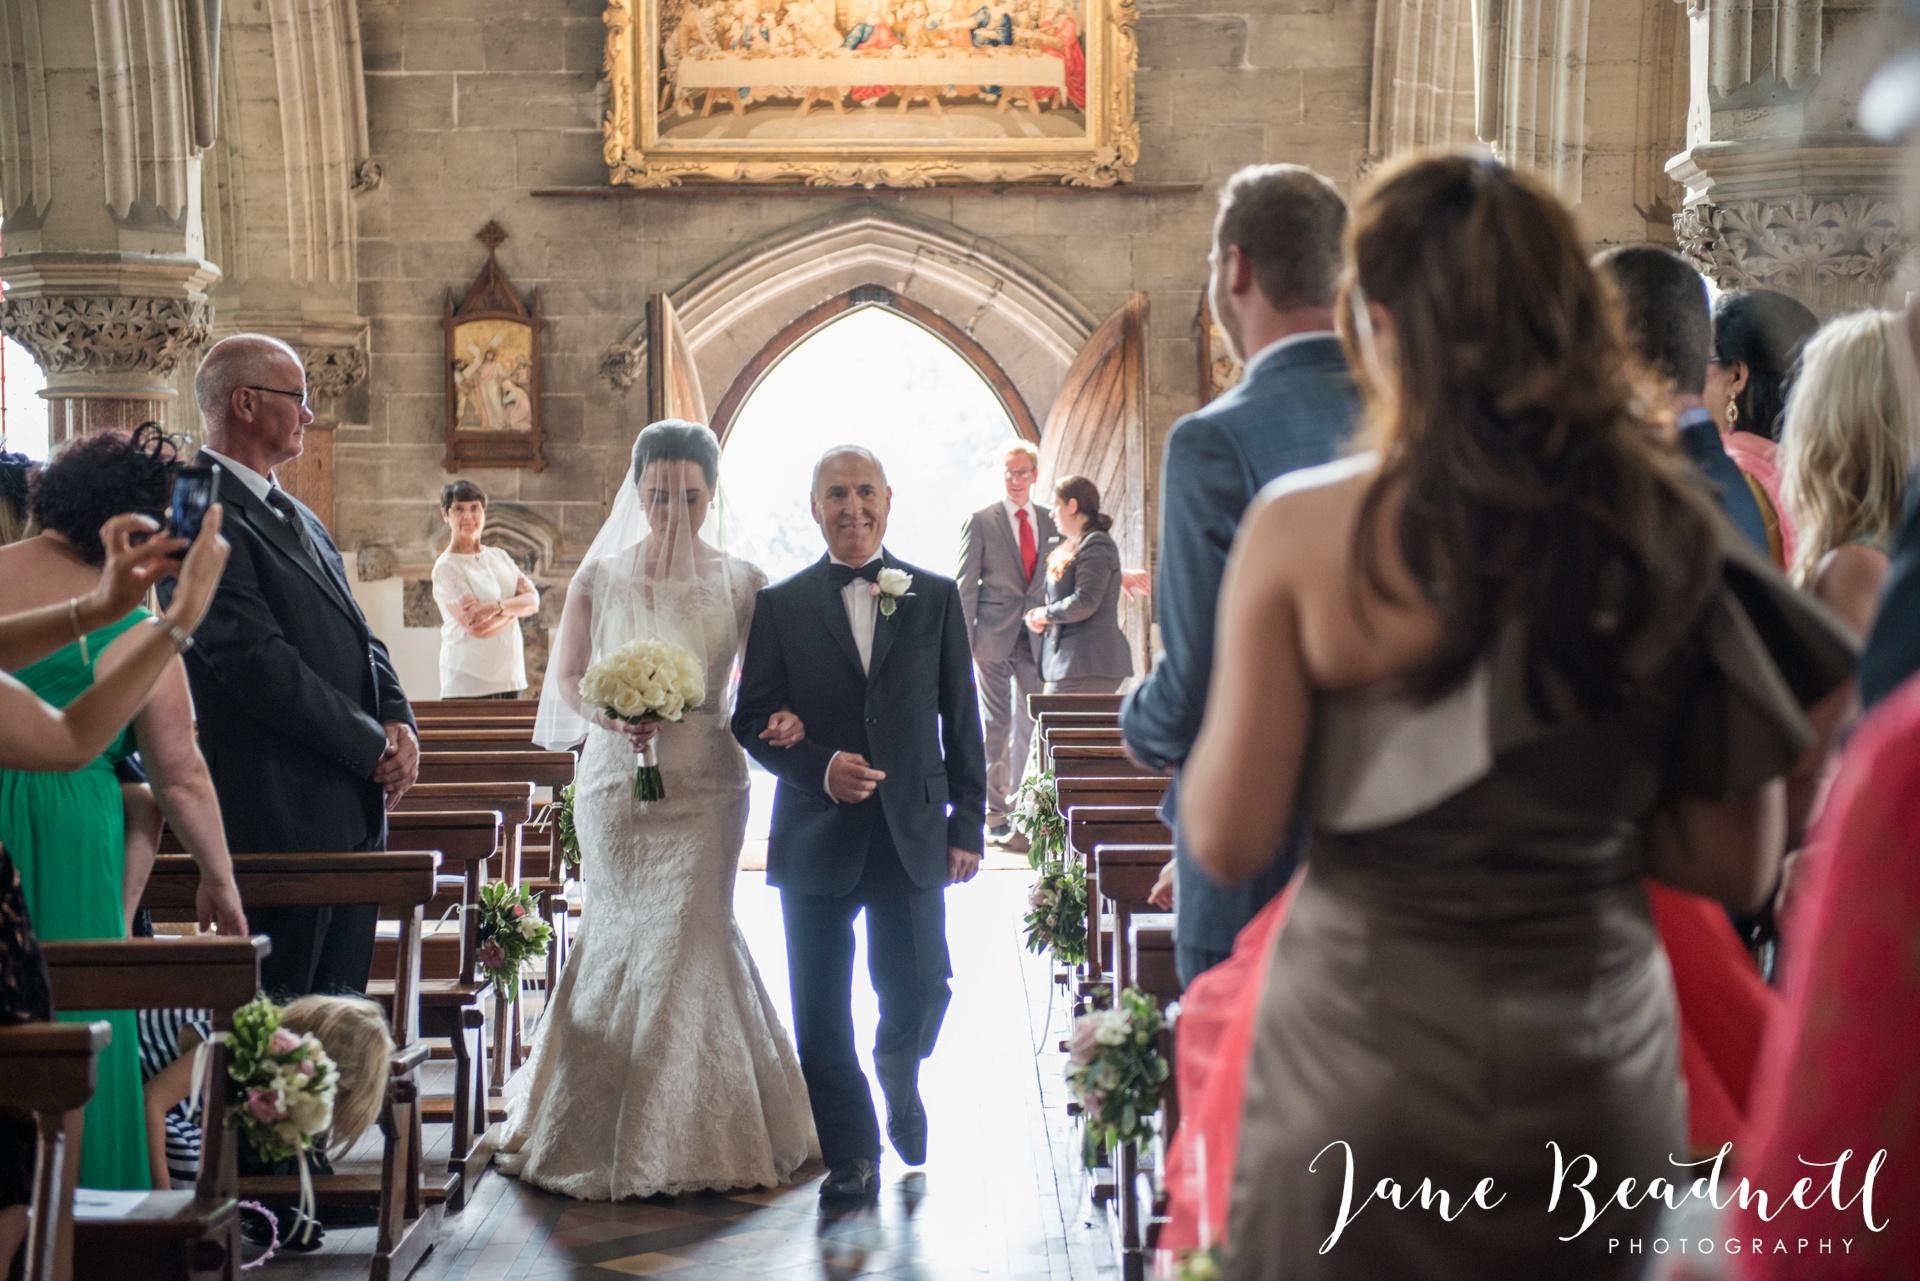 Jane Beadnell fine art wedding photographer Rudding Park Harrogate_0026